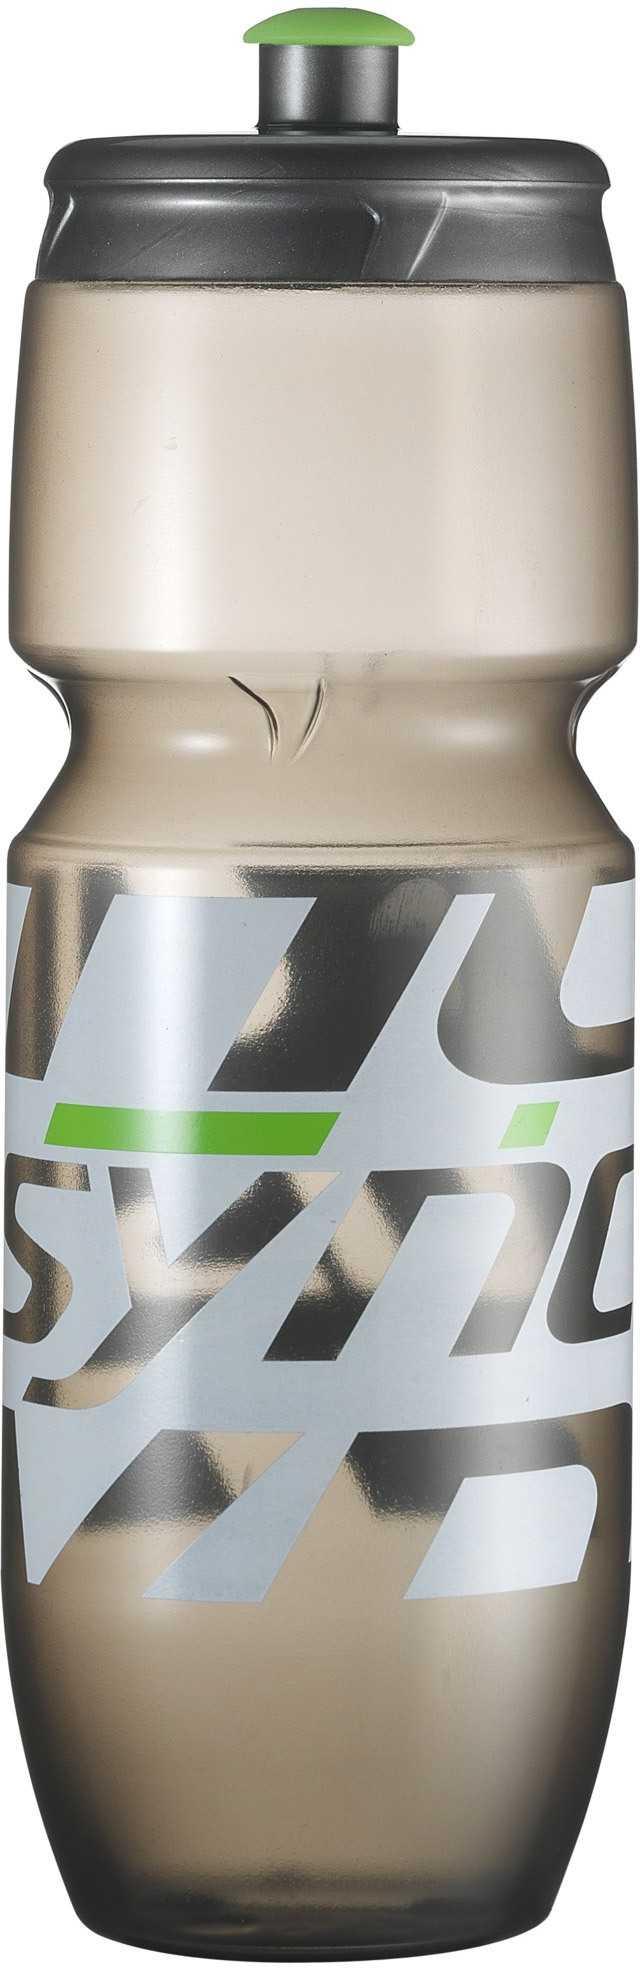 FLASKE SYNCROS CORPORATE 2.0 700 ML RØG/GRØN | Drikkedunke